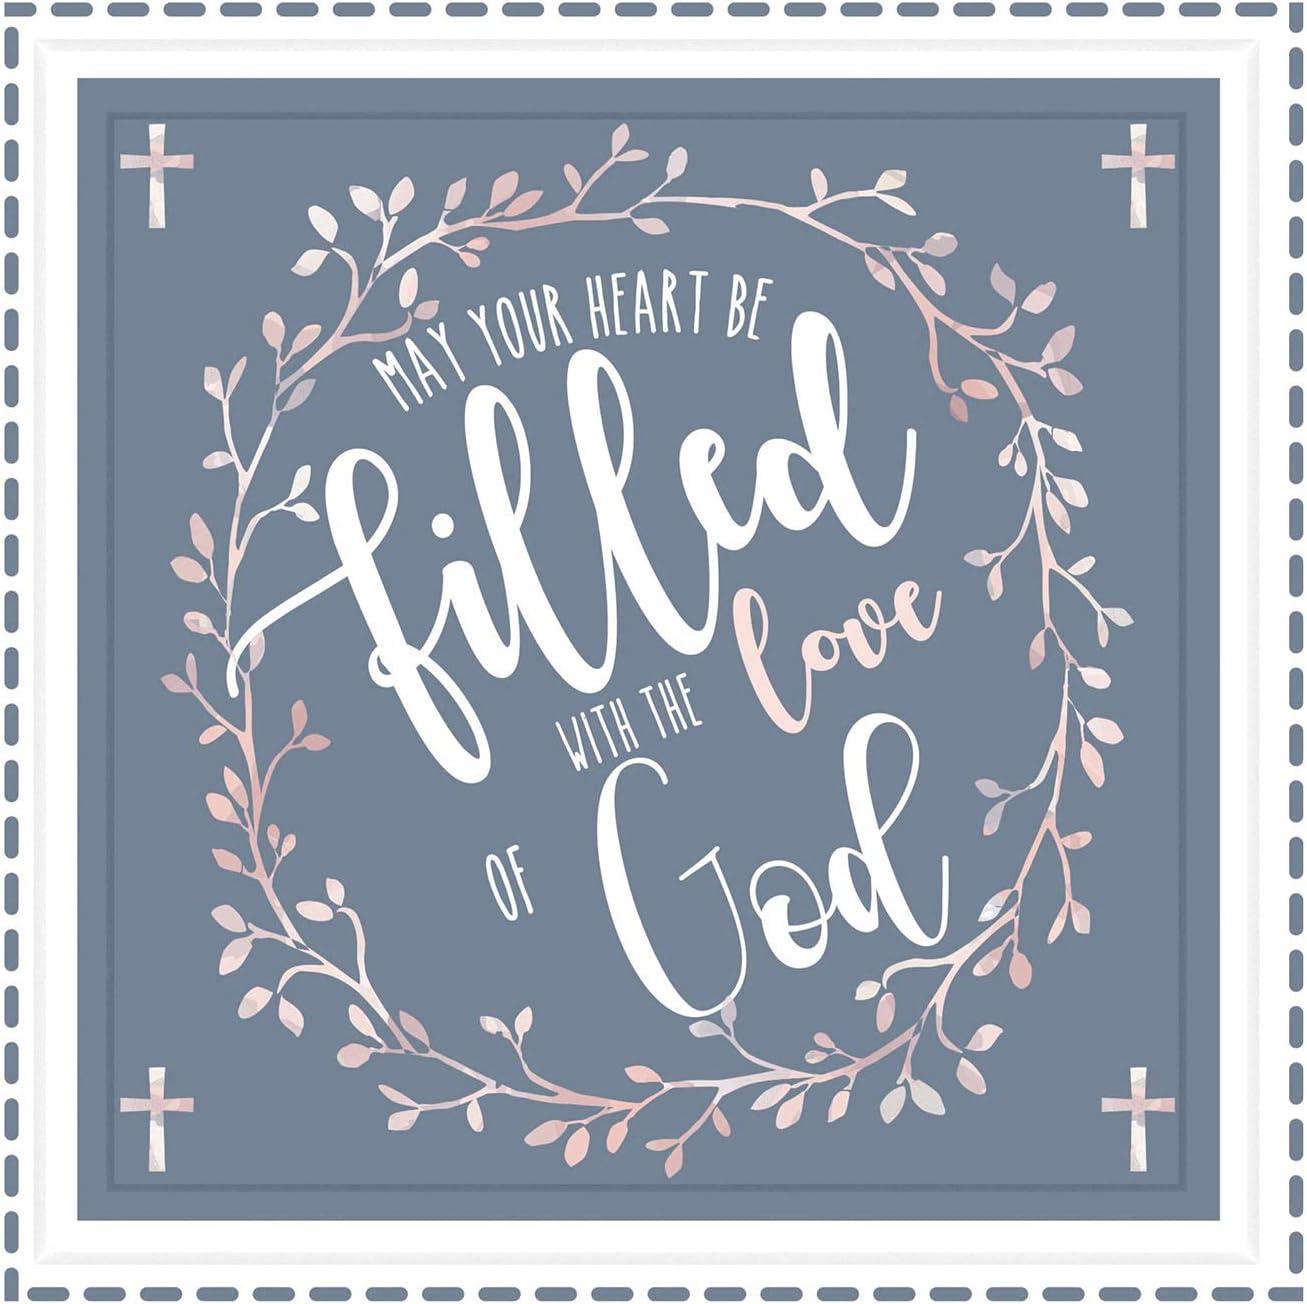 Baptism Gifts | 7X7 Tile Artwork | Christening Decoration for Boys & Girls | Godparents Catholic Gift | Ideal Present for Goddaughter & Godson | Beautiful Art for Baby Baptisms